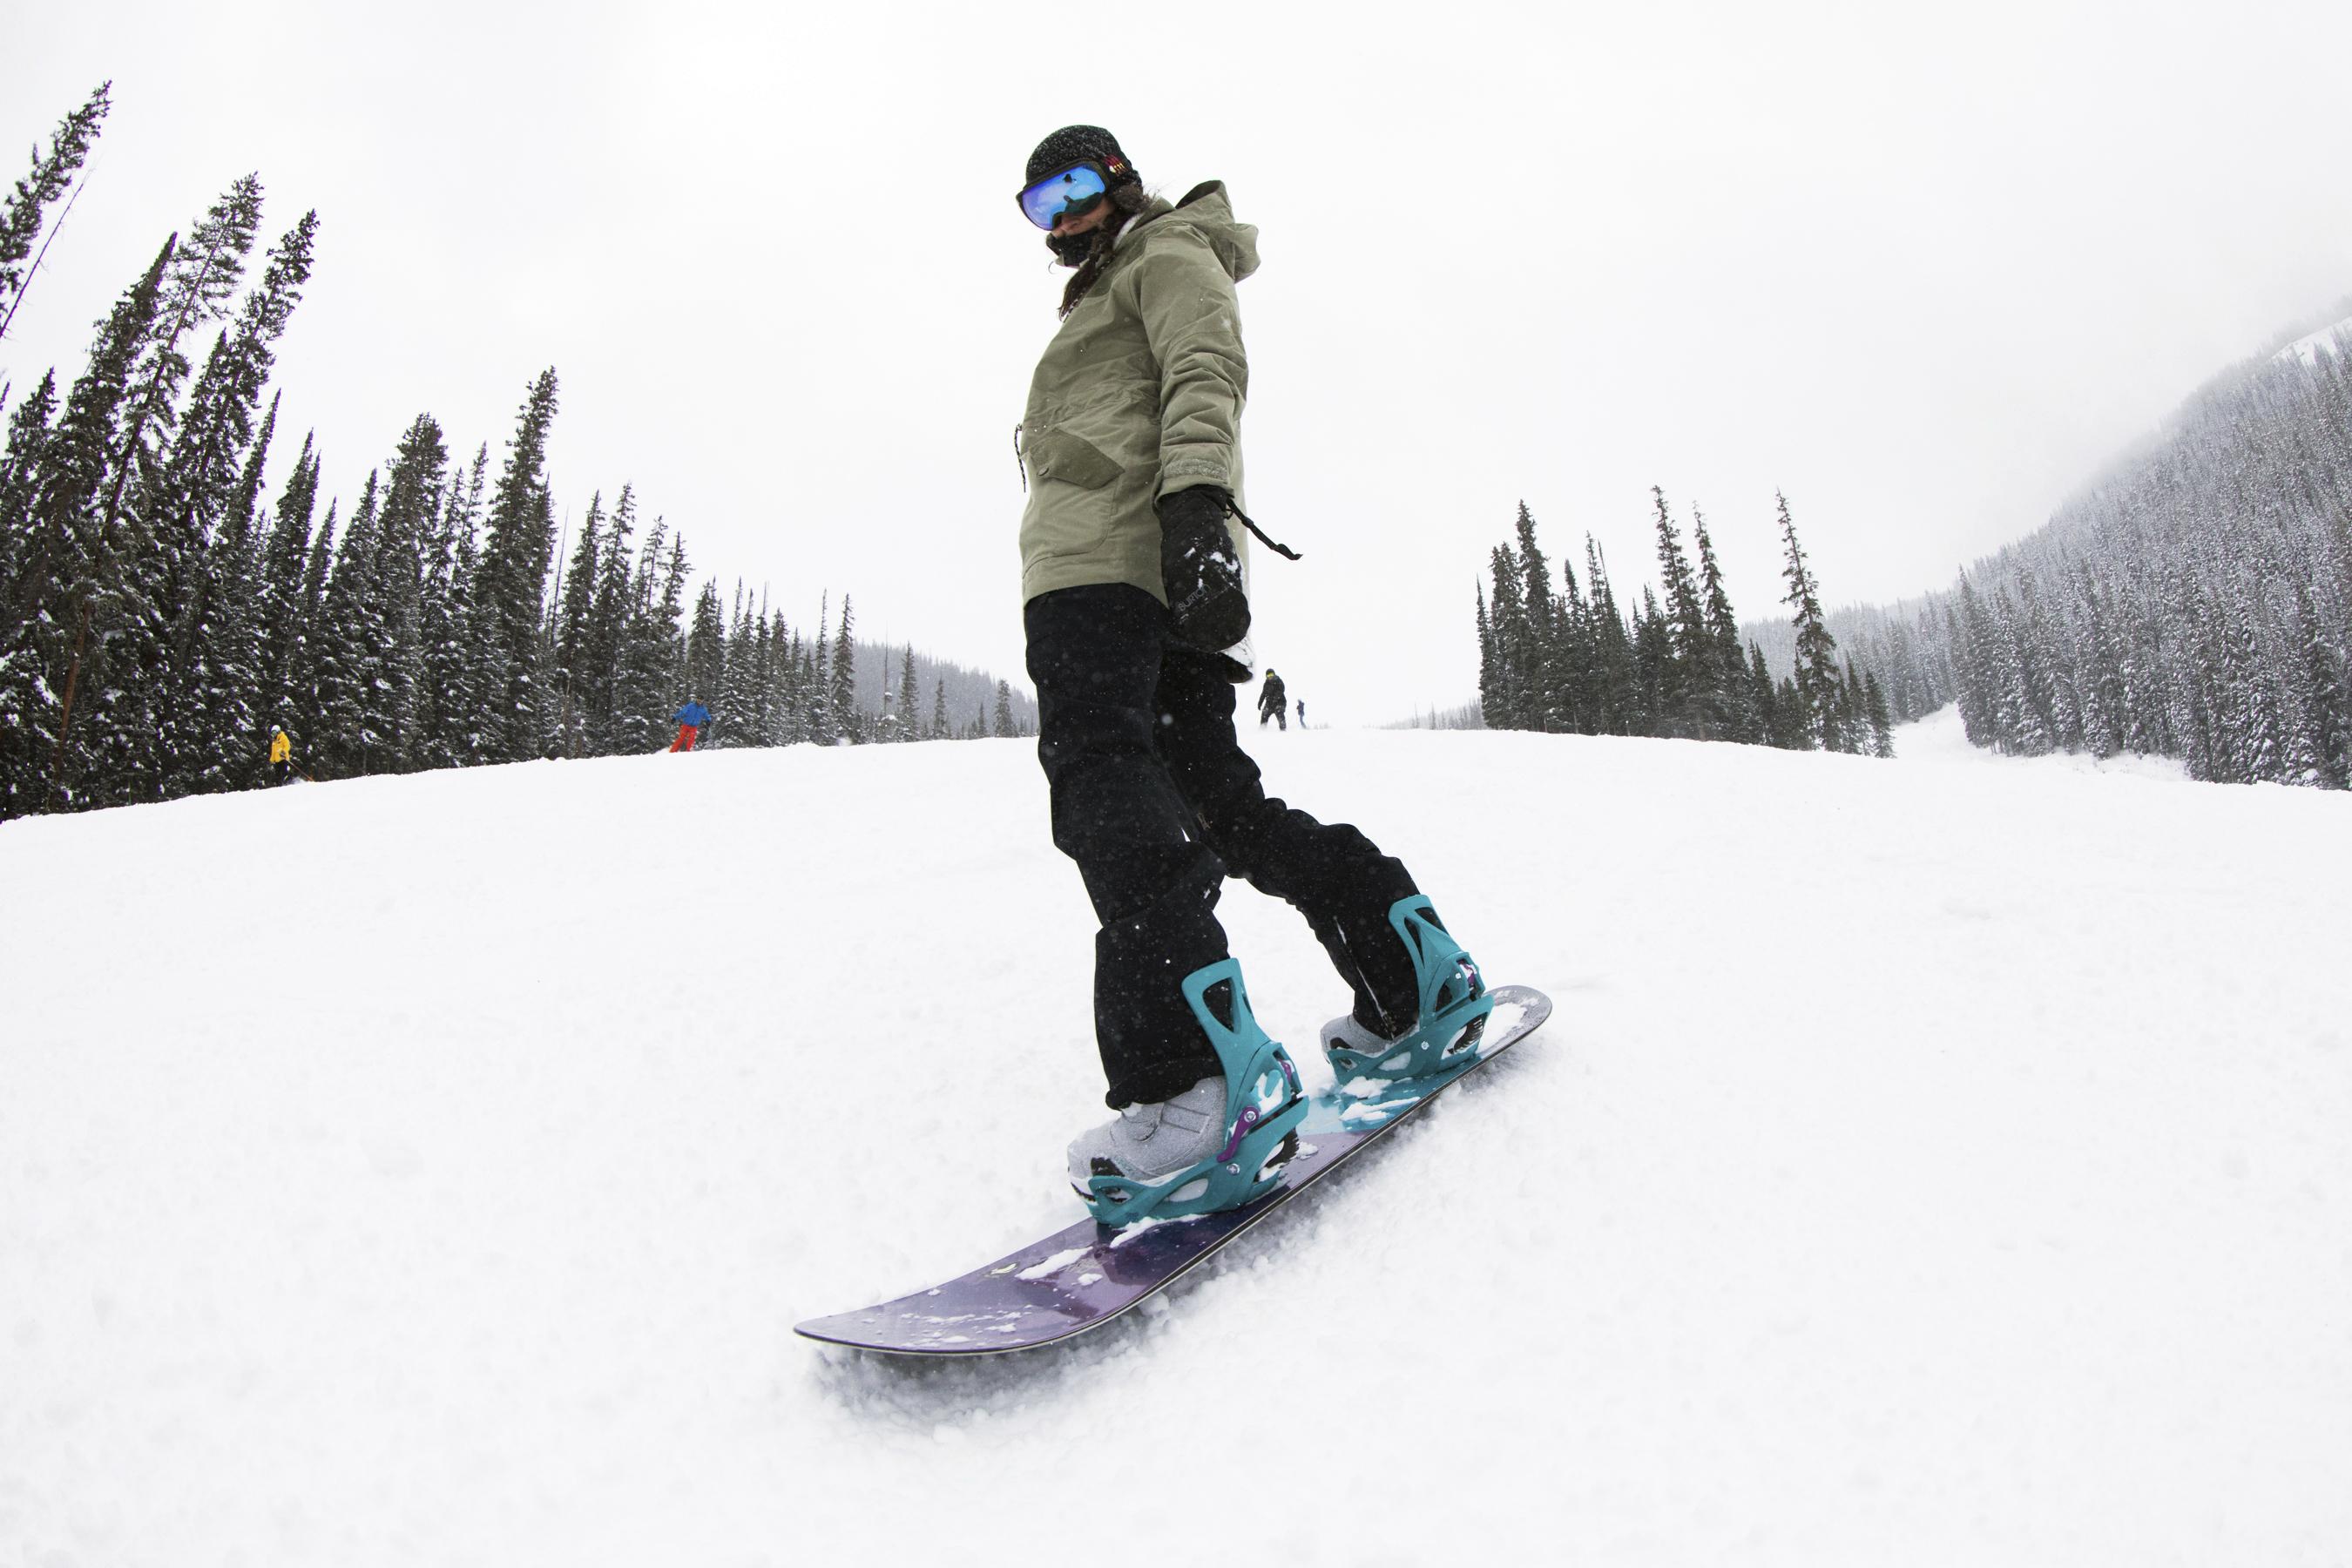 descriptive essay on skiing